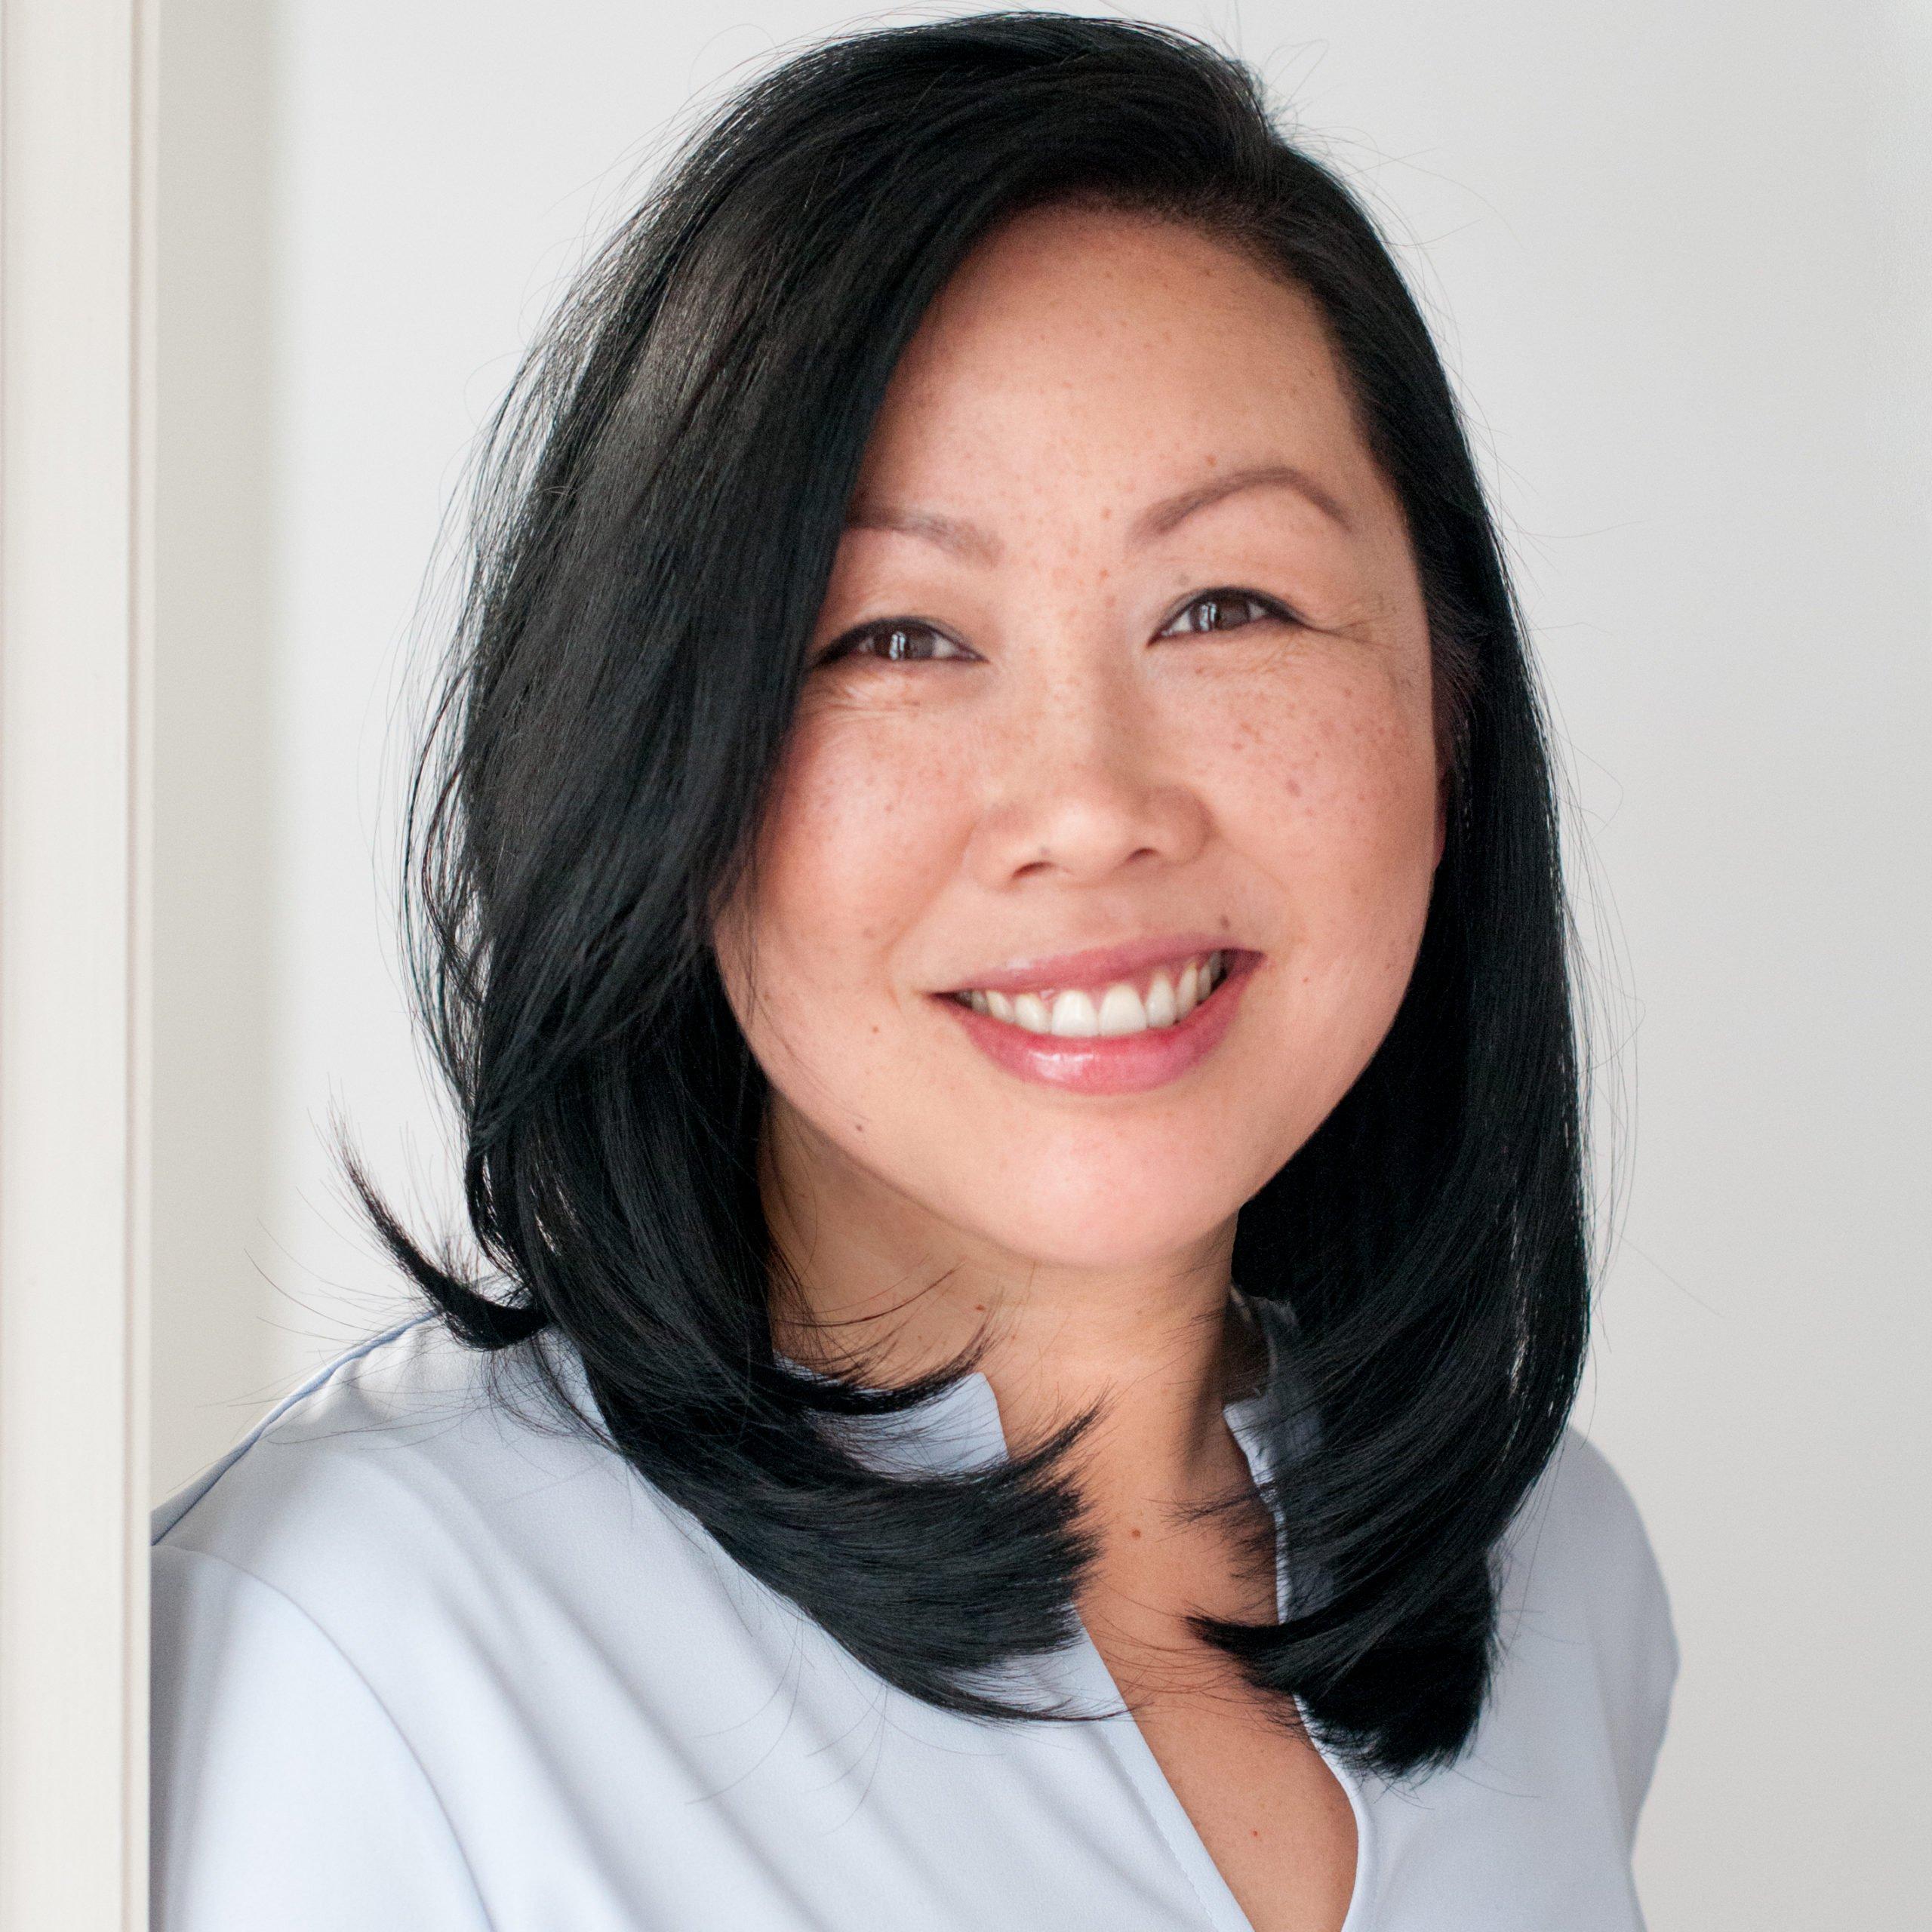 Karen Hsiung